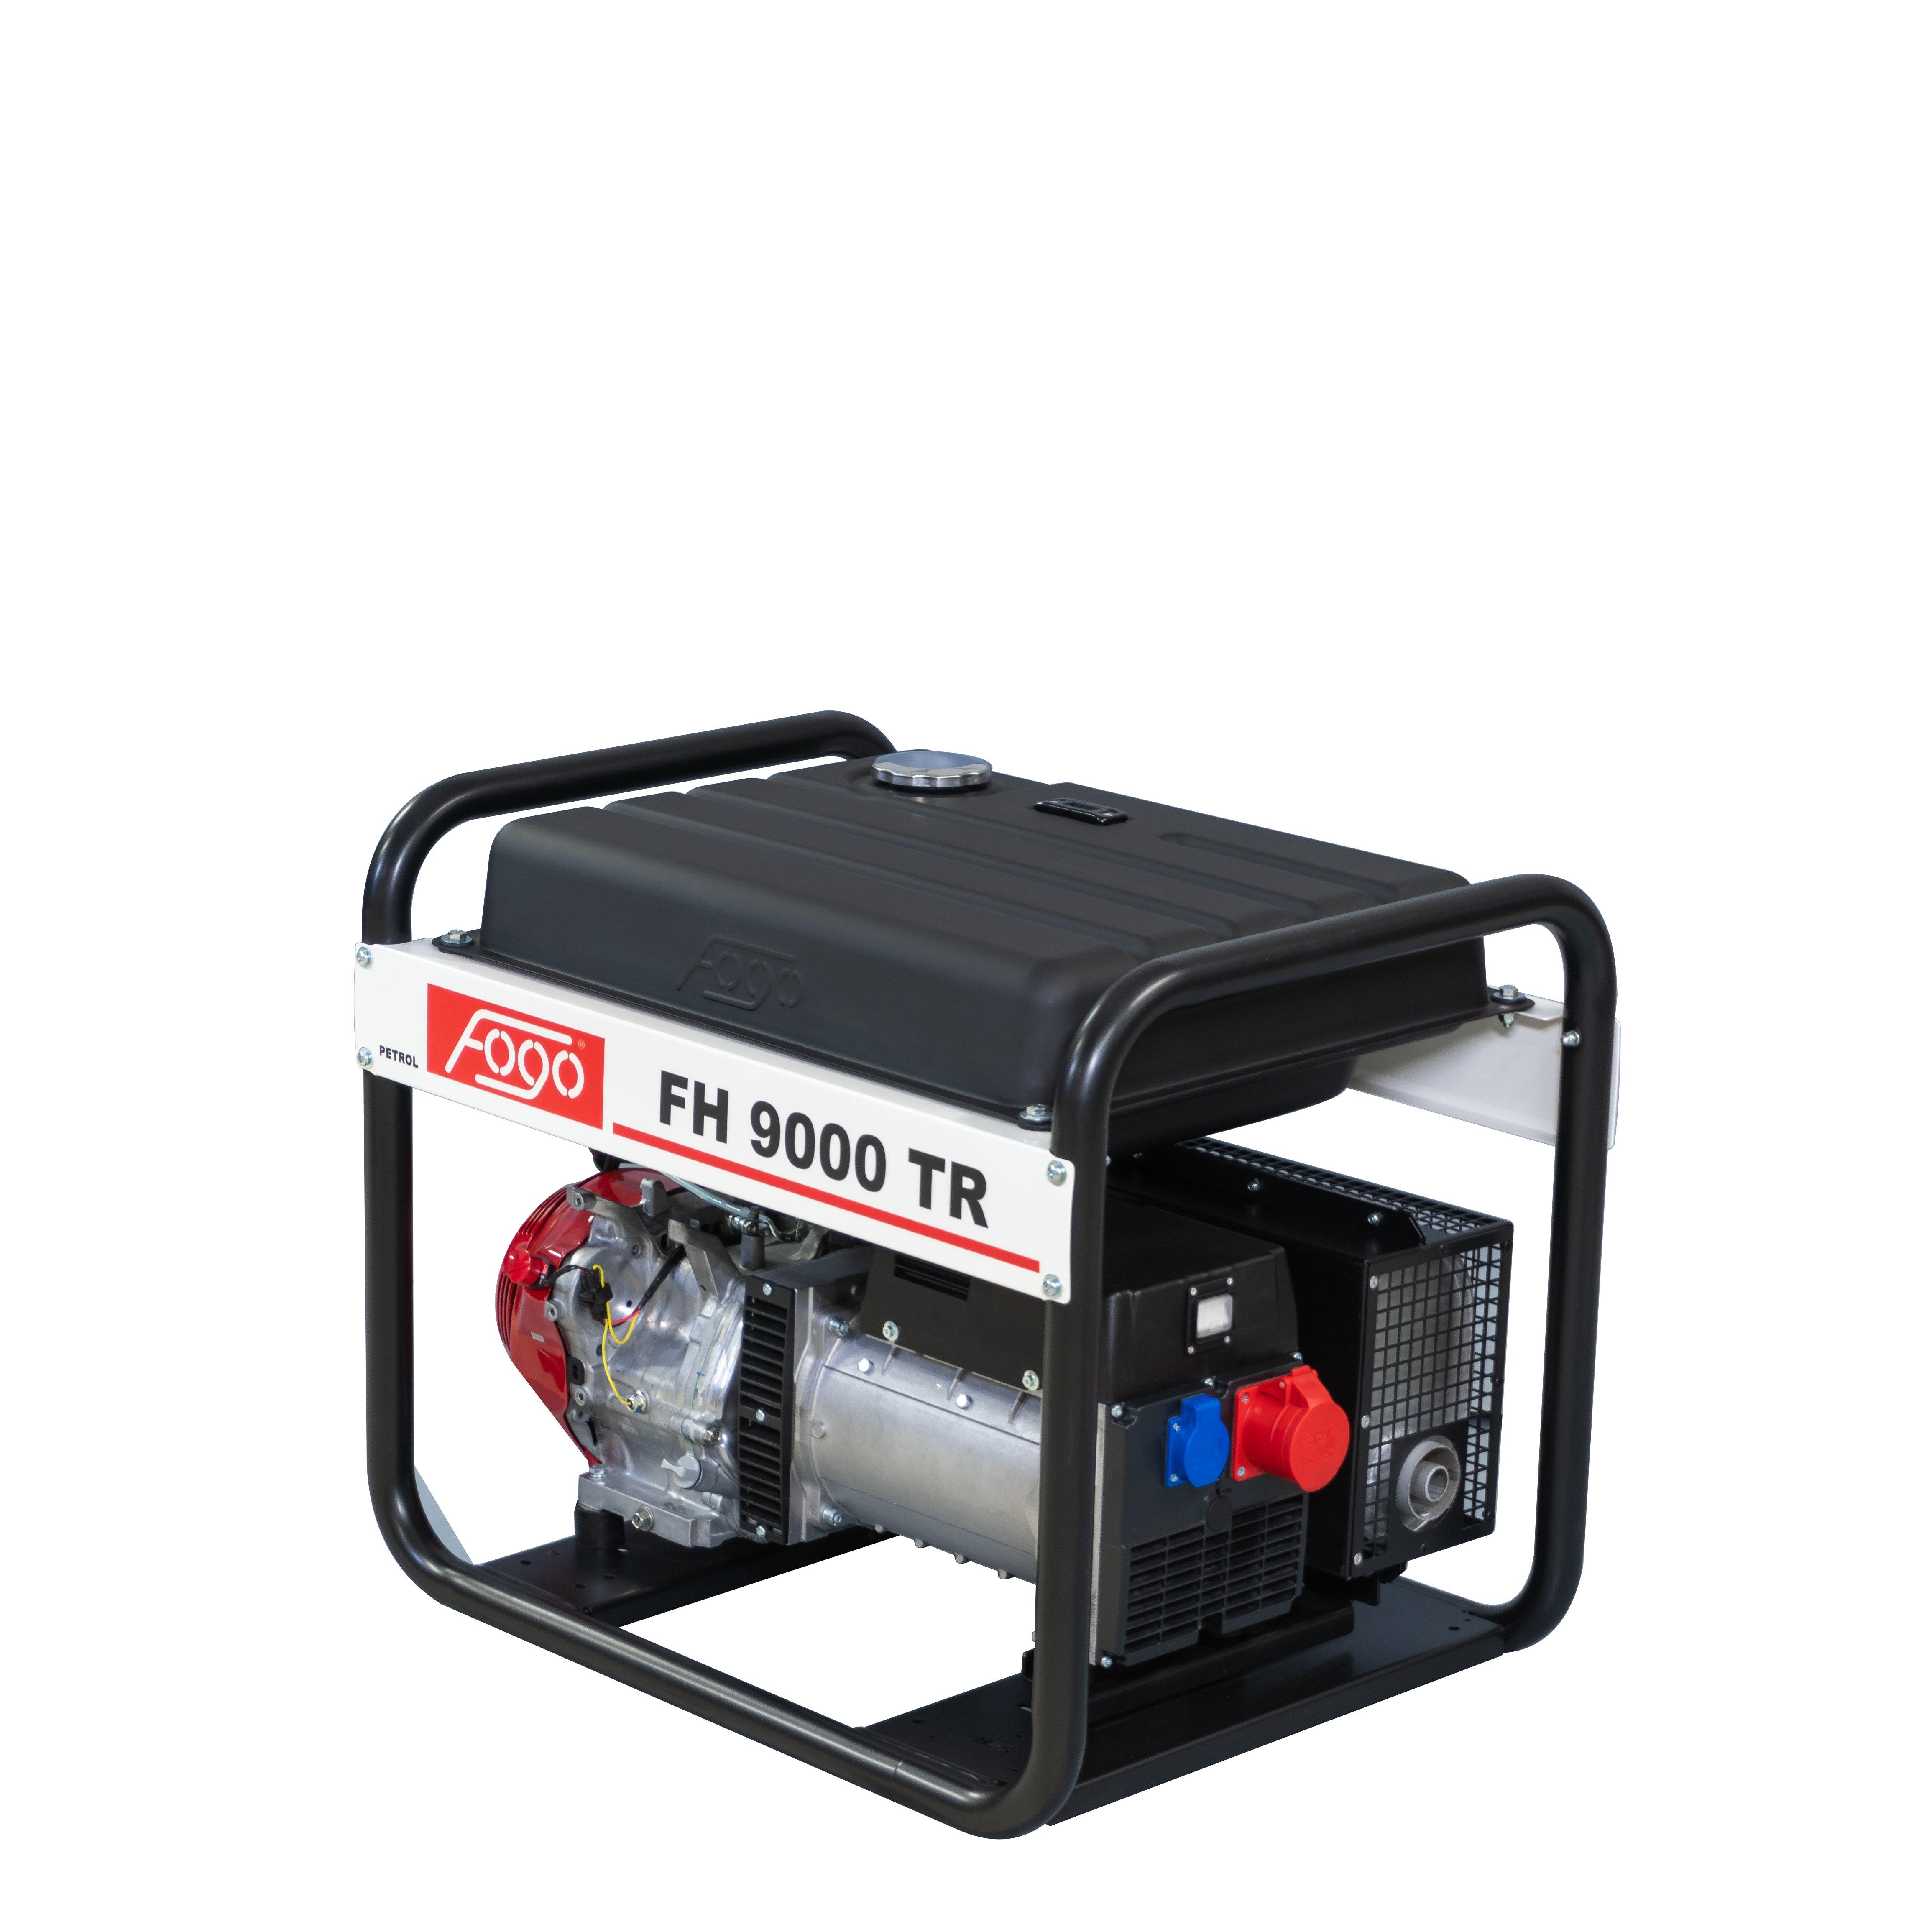 VORVERKAUF!!! FOGO Powered by HONDA 8,5 kVA Stromaggregat 400 V FH 9000TR